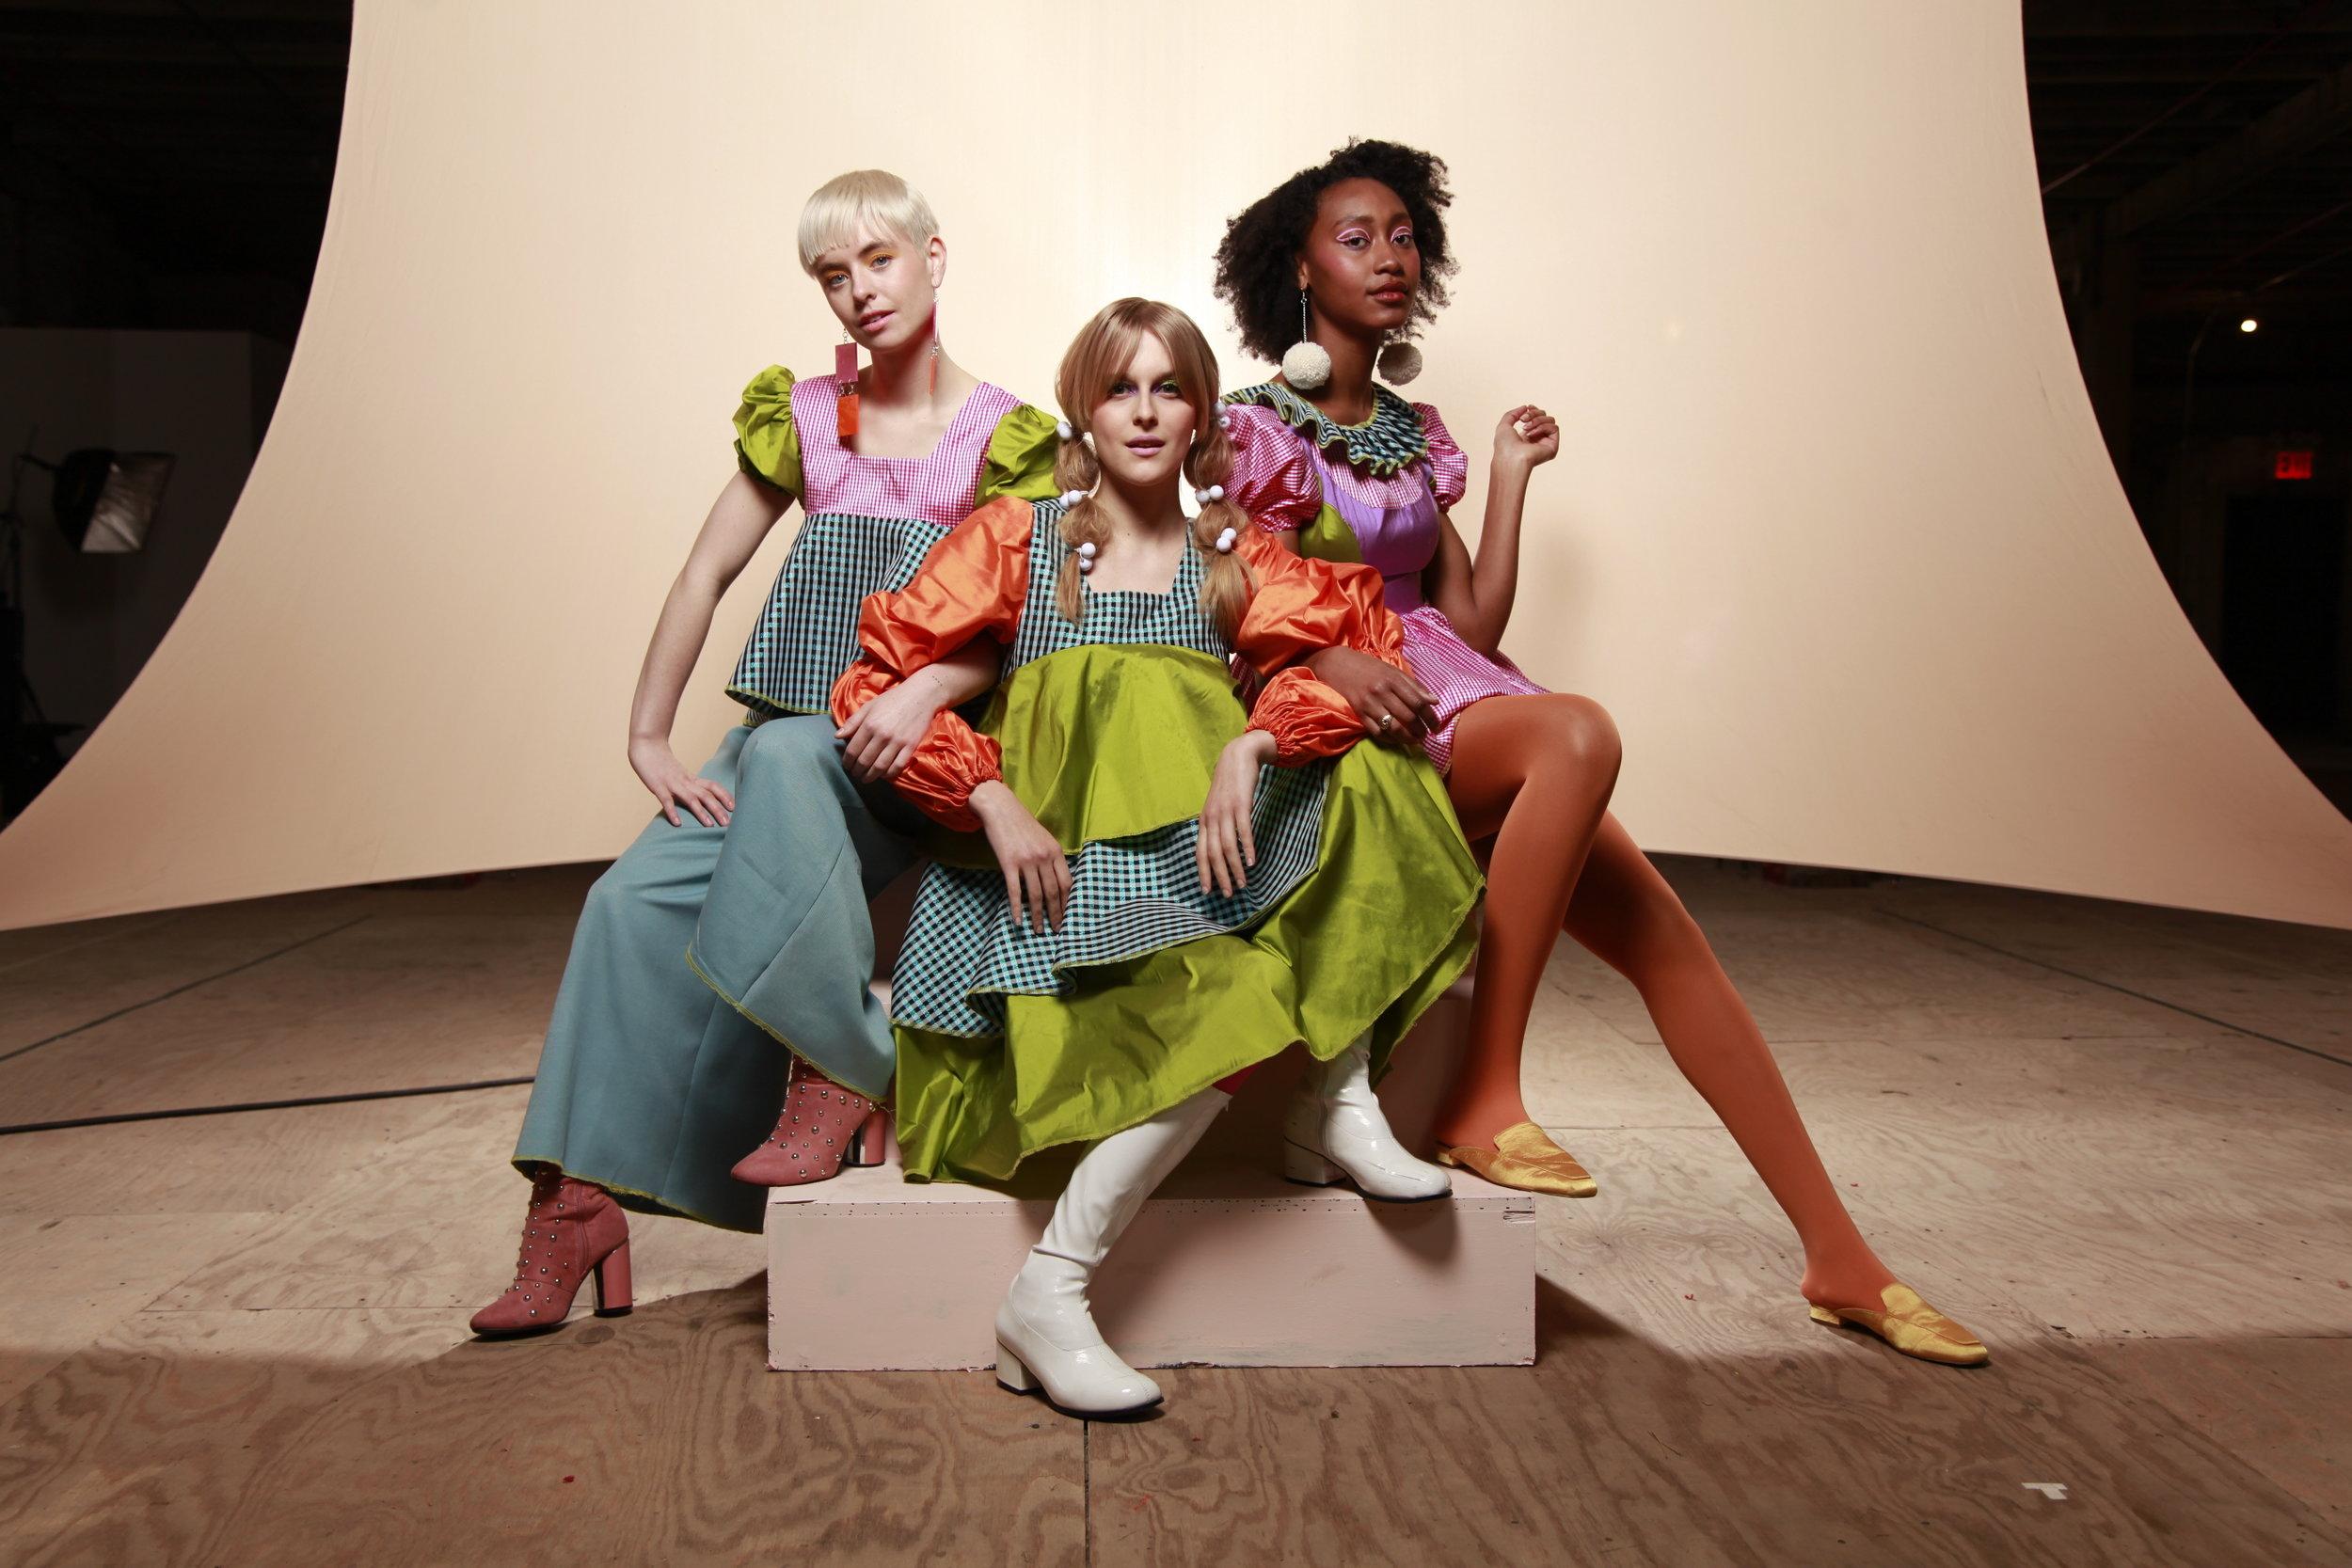 Models: Alexandra Dorschner, Anastasia Standrik, Danielle Mareka